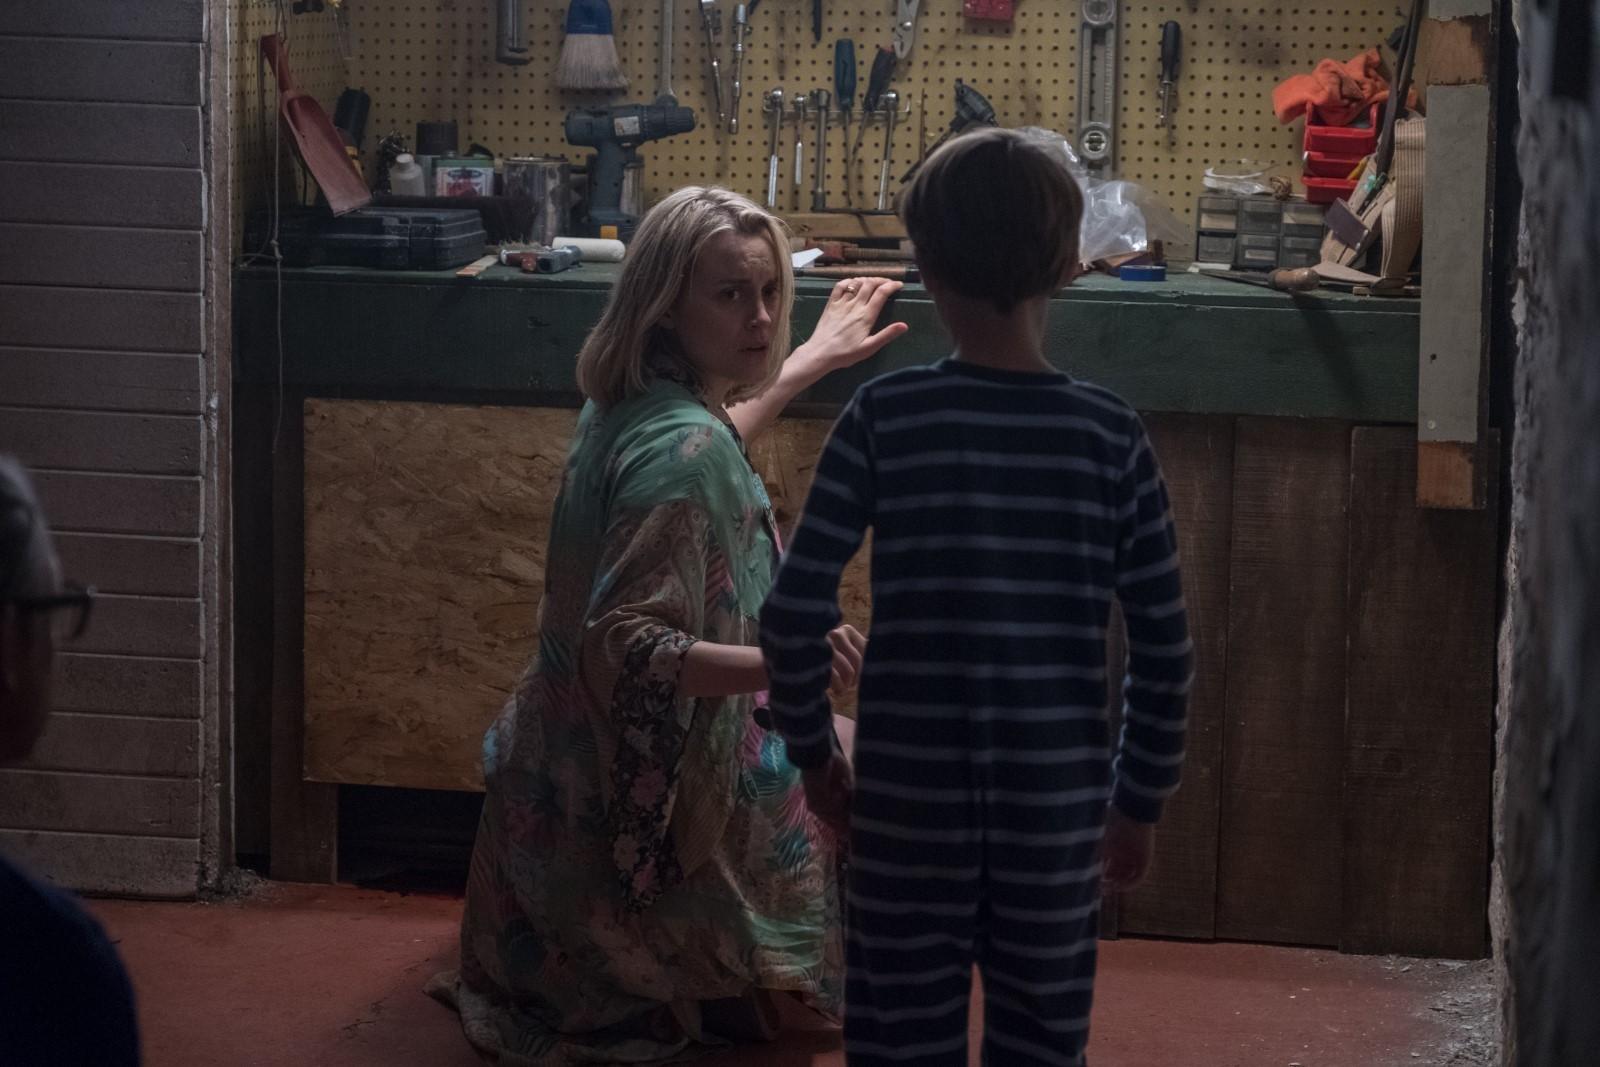 Filme de terror 'Maligno' estreia no cinema de Vilhena, RO - Noticias